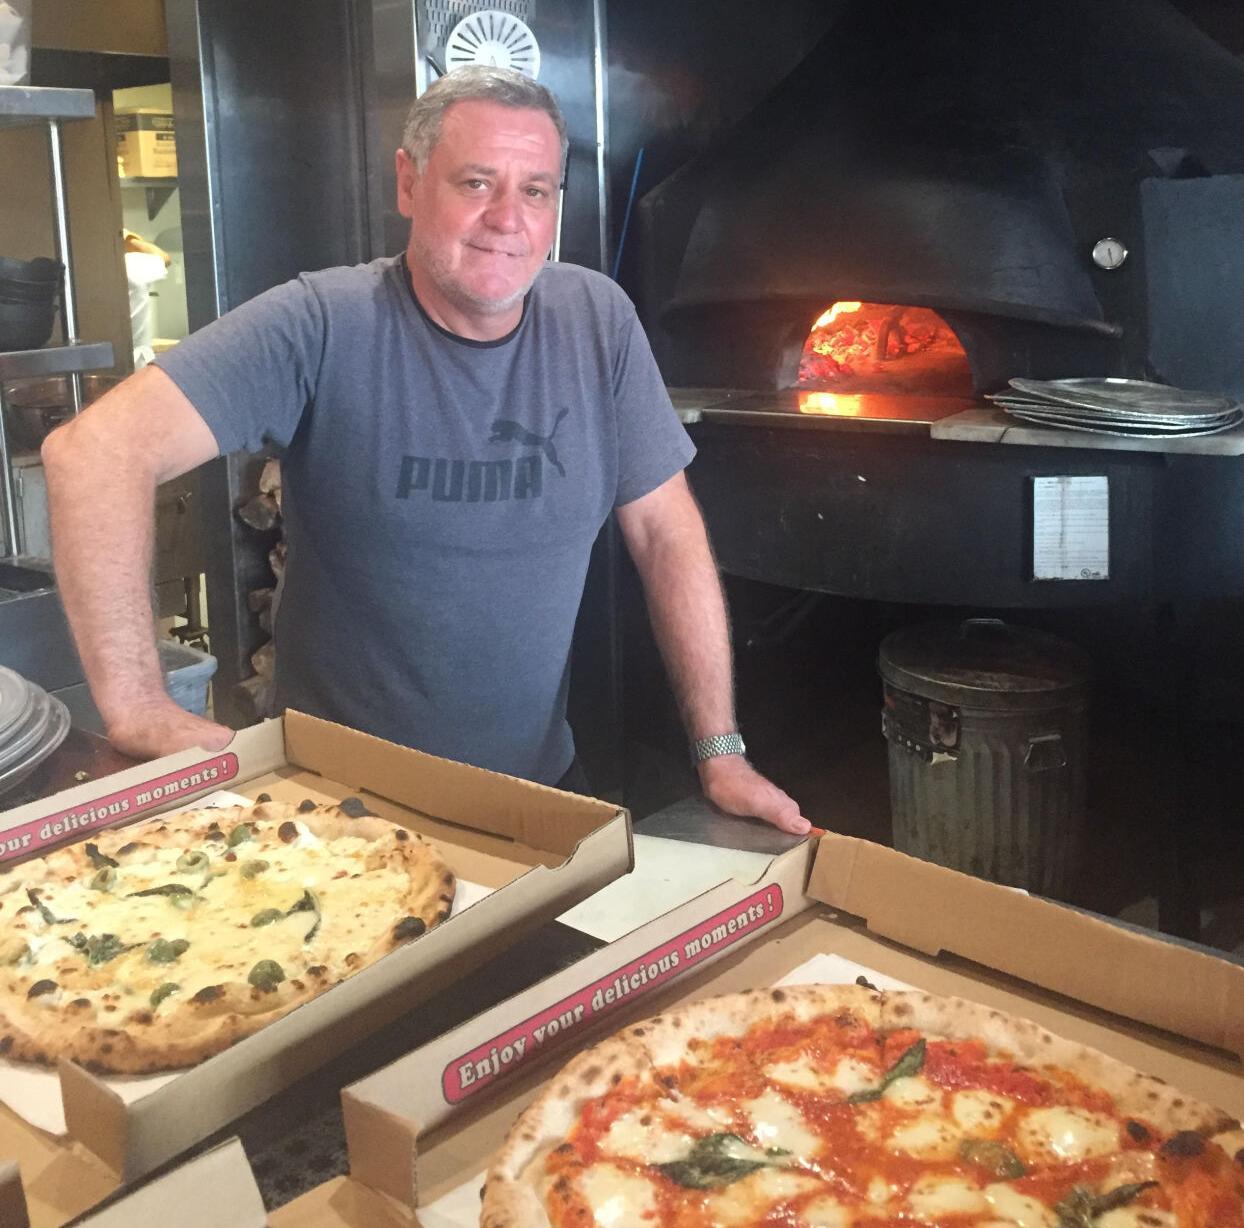 Claudio Blotta in front of All'Acqua's firewood pizza oven